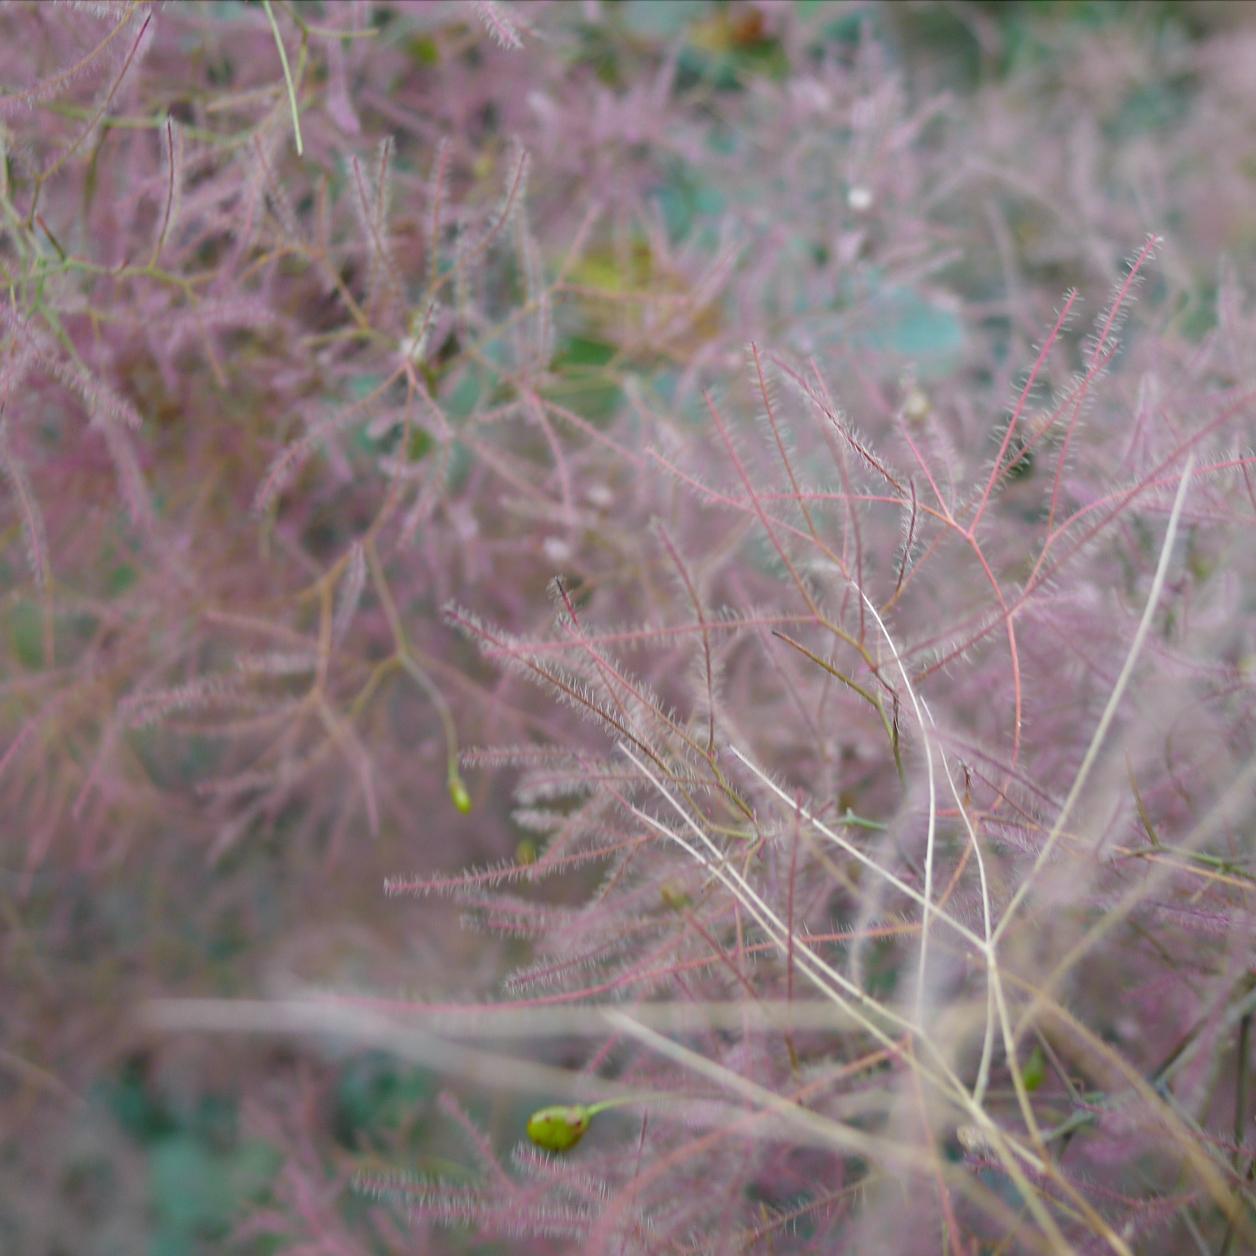 Closeup of a fuzzy purple plant looking like cloudy haze